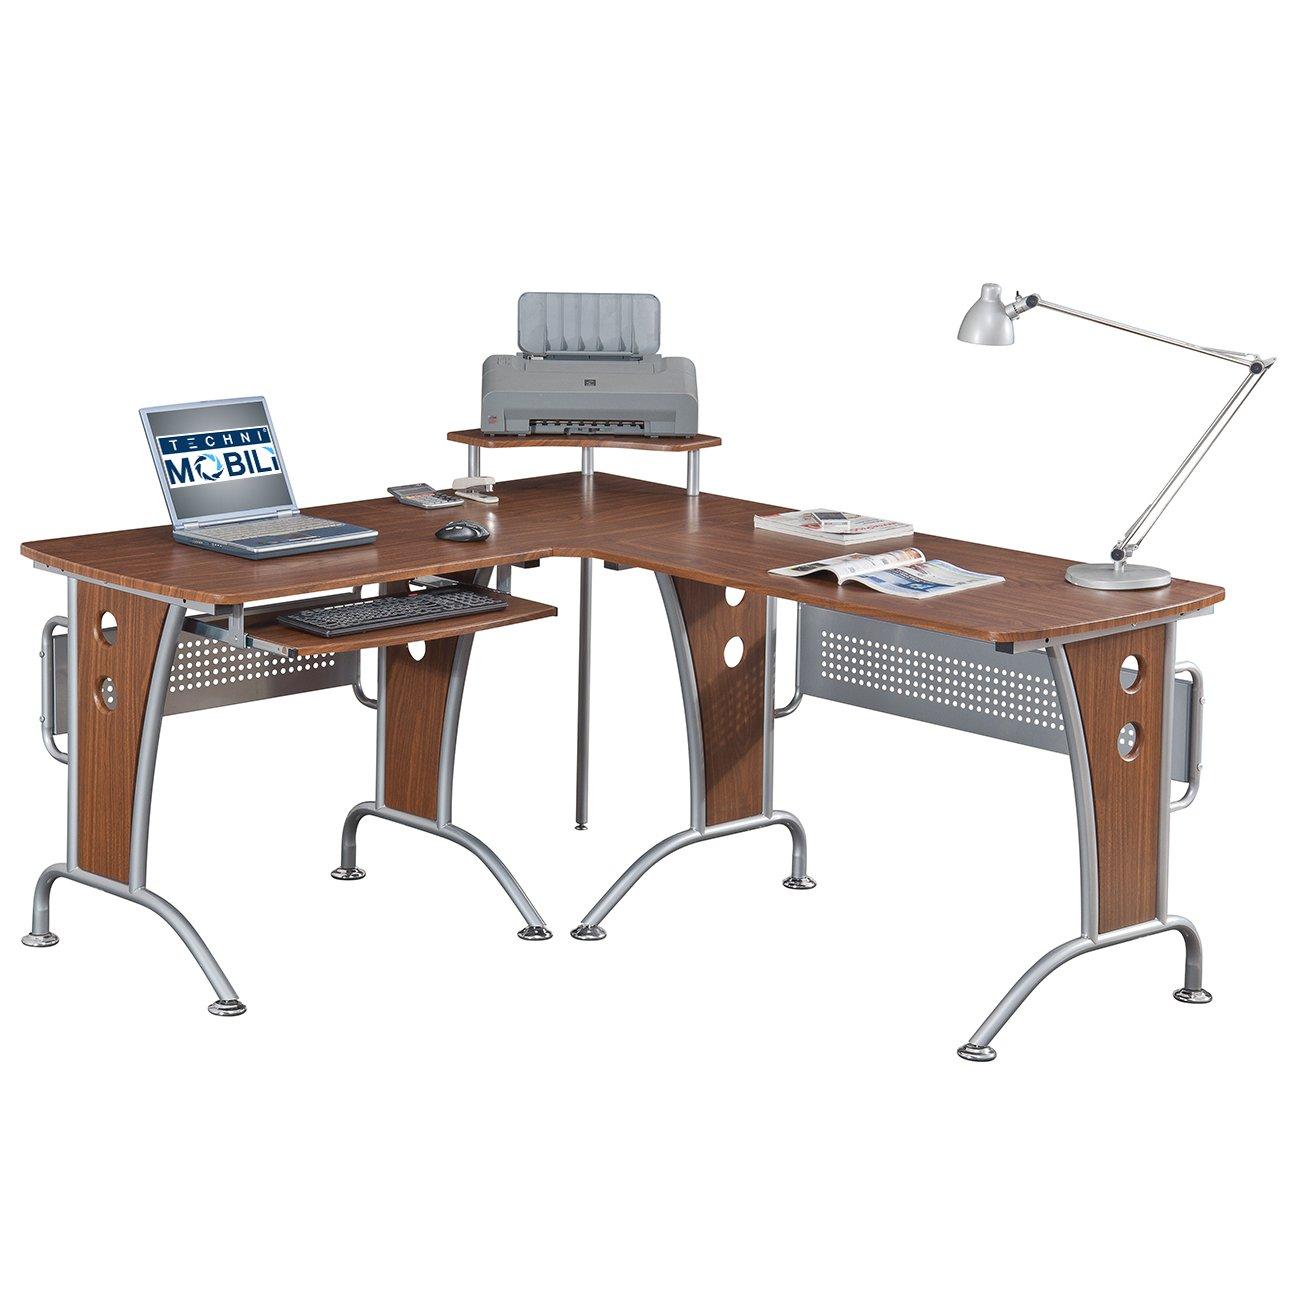 Amazon.com: Space Saver Computer L Desk: Kitchen & Dining